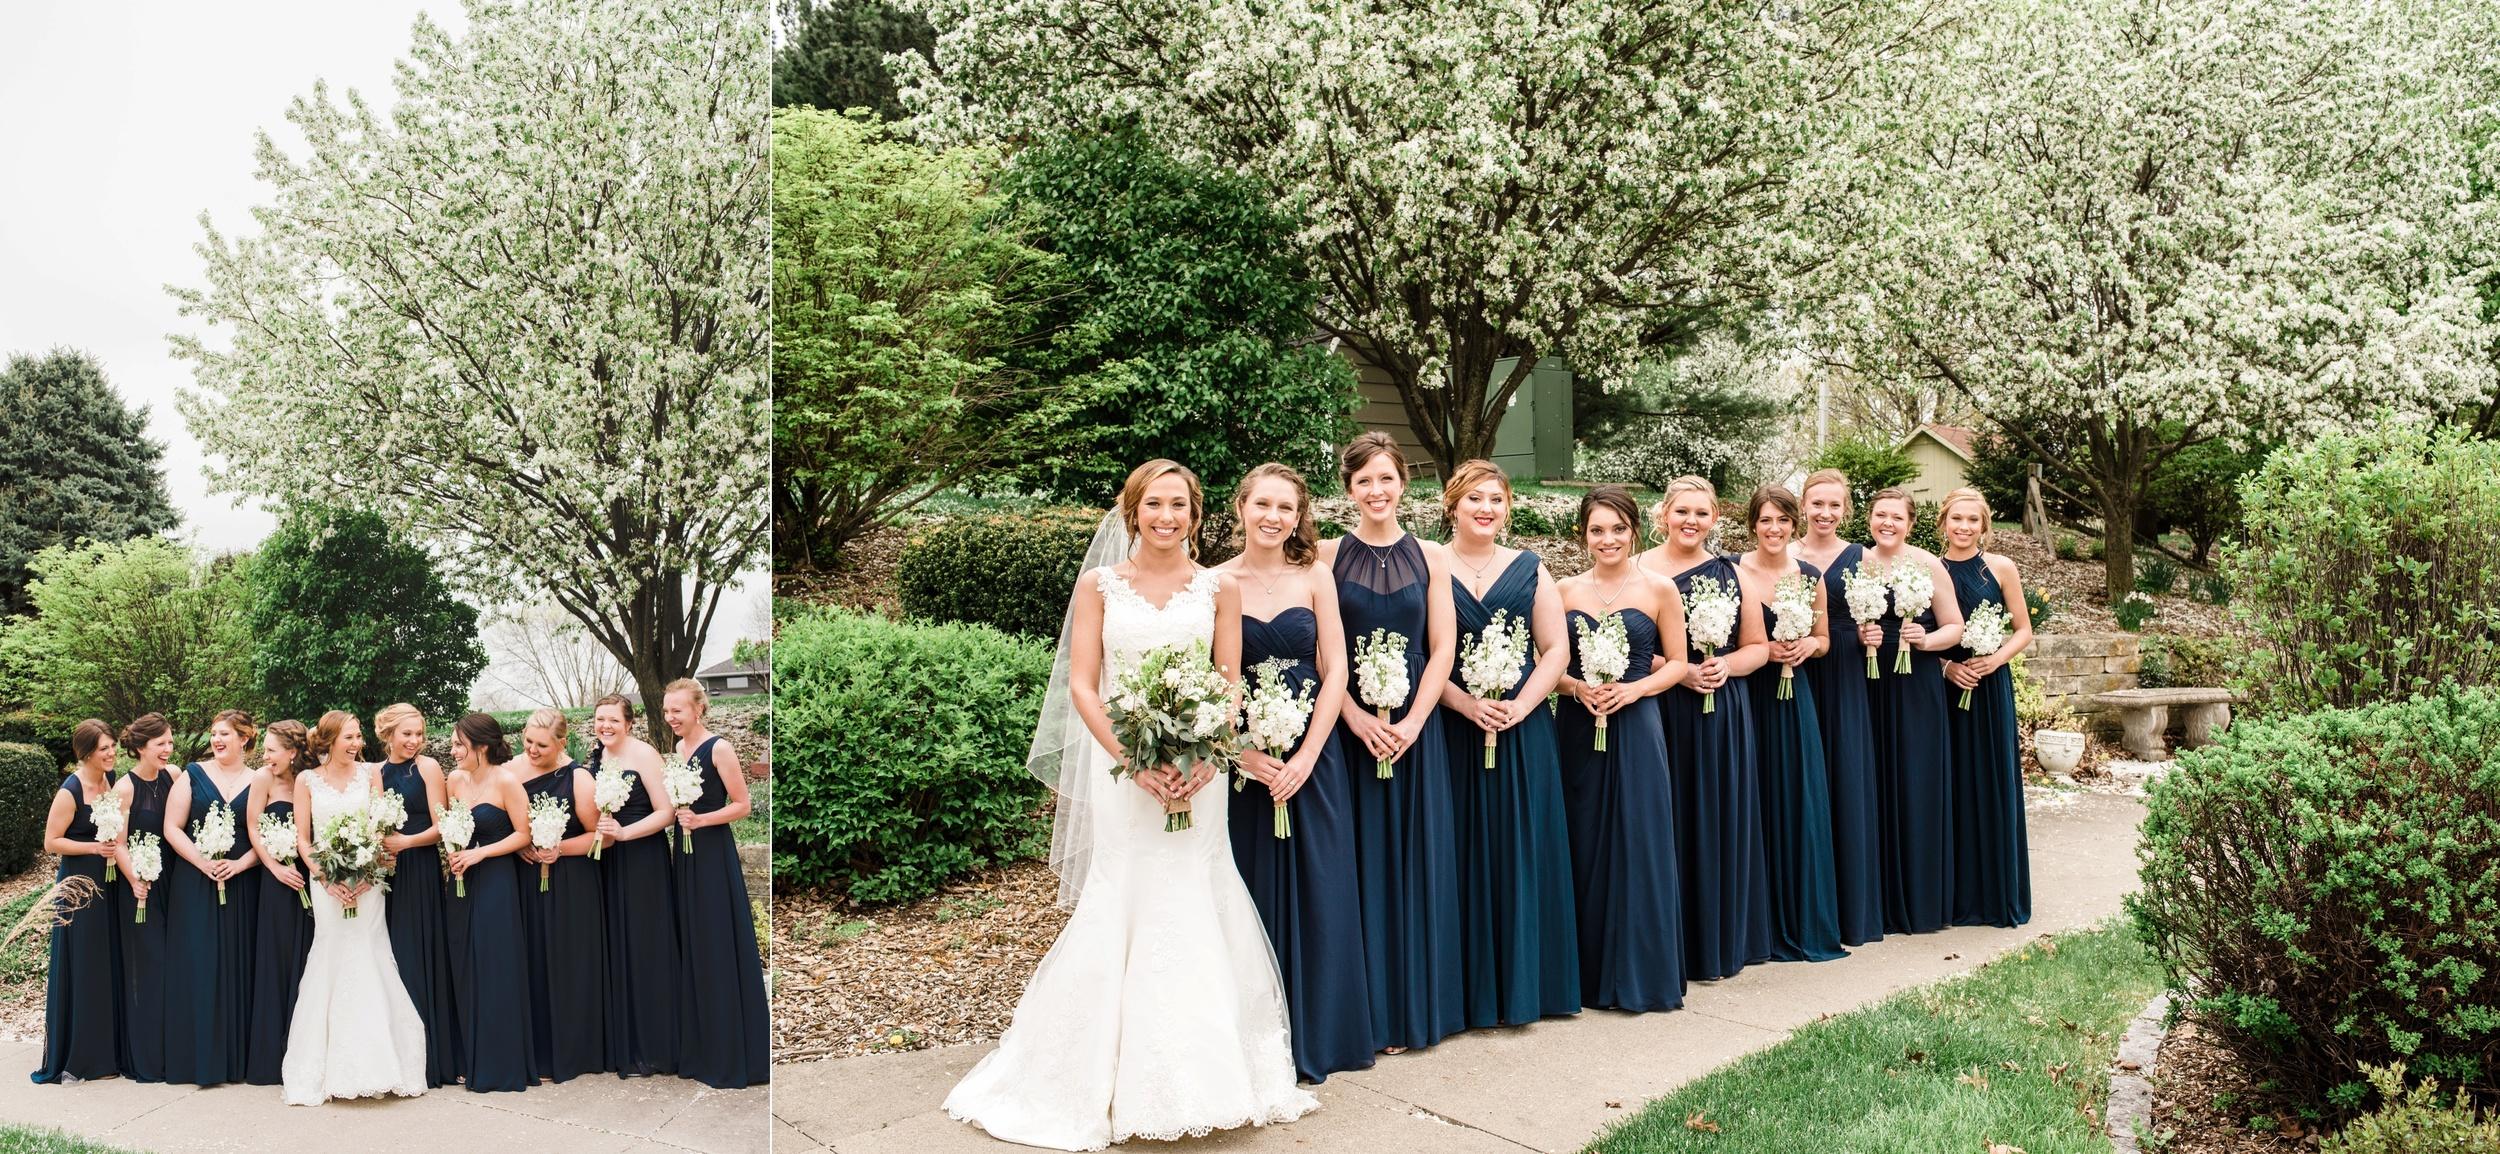 Pleasant Hill Des Moines Wedding Photographer_2217.jpg